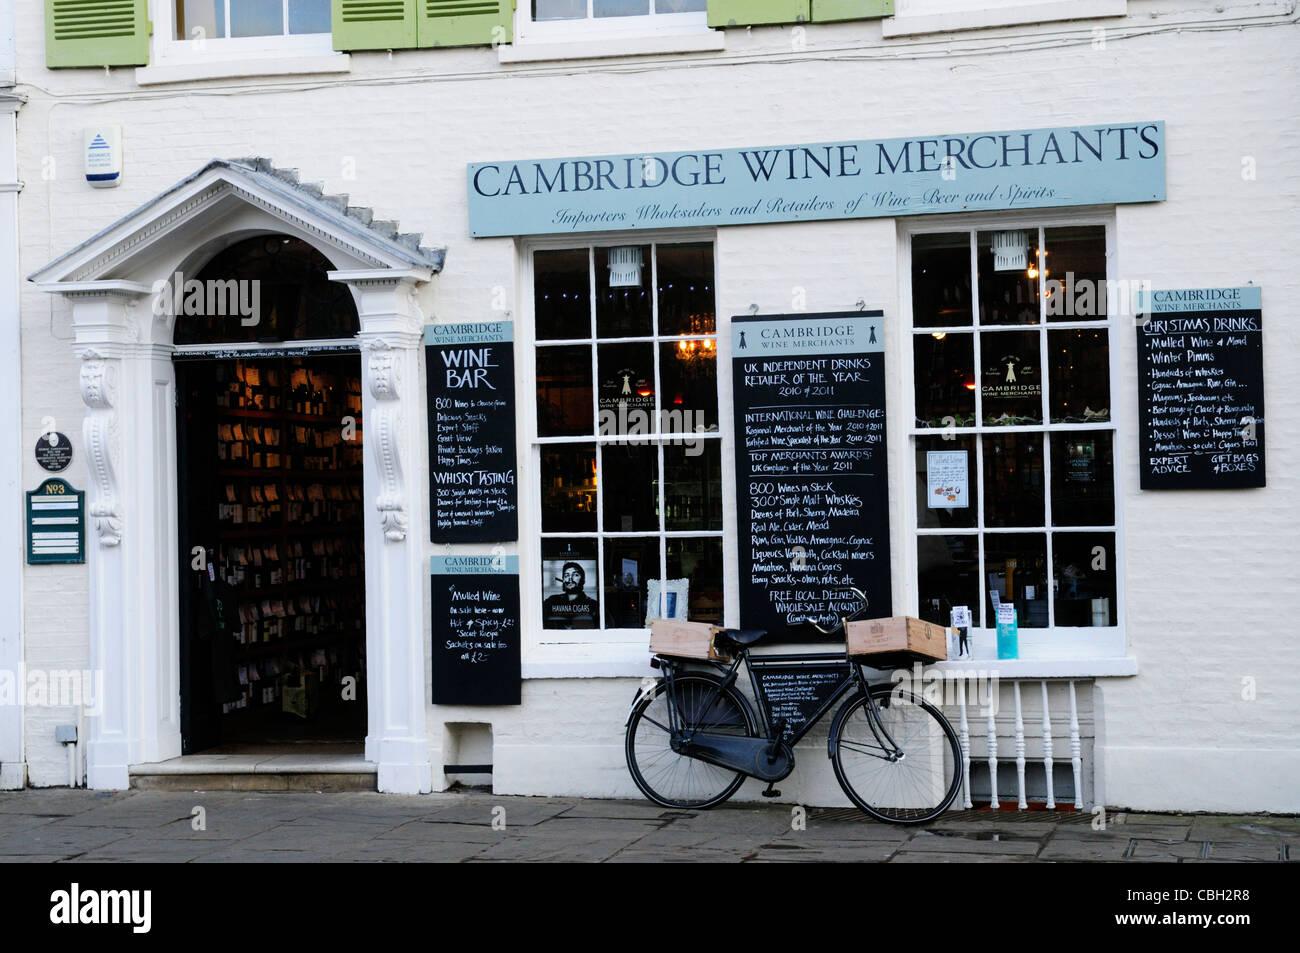 Cambridge Wine Merchants, King's Parade, Cambridge, England, UK - Stock Image